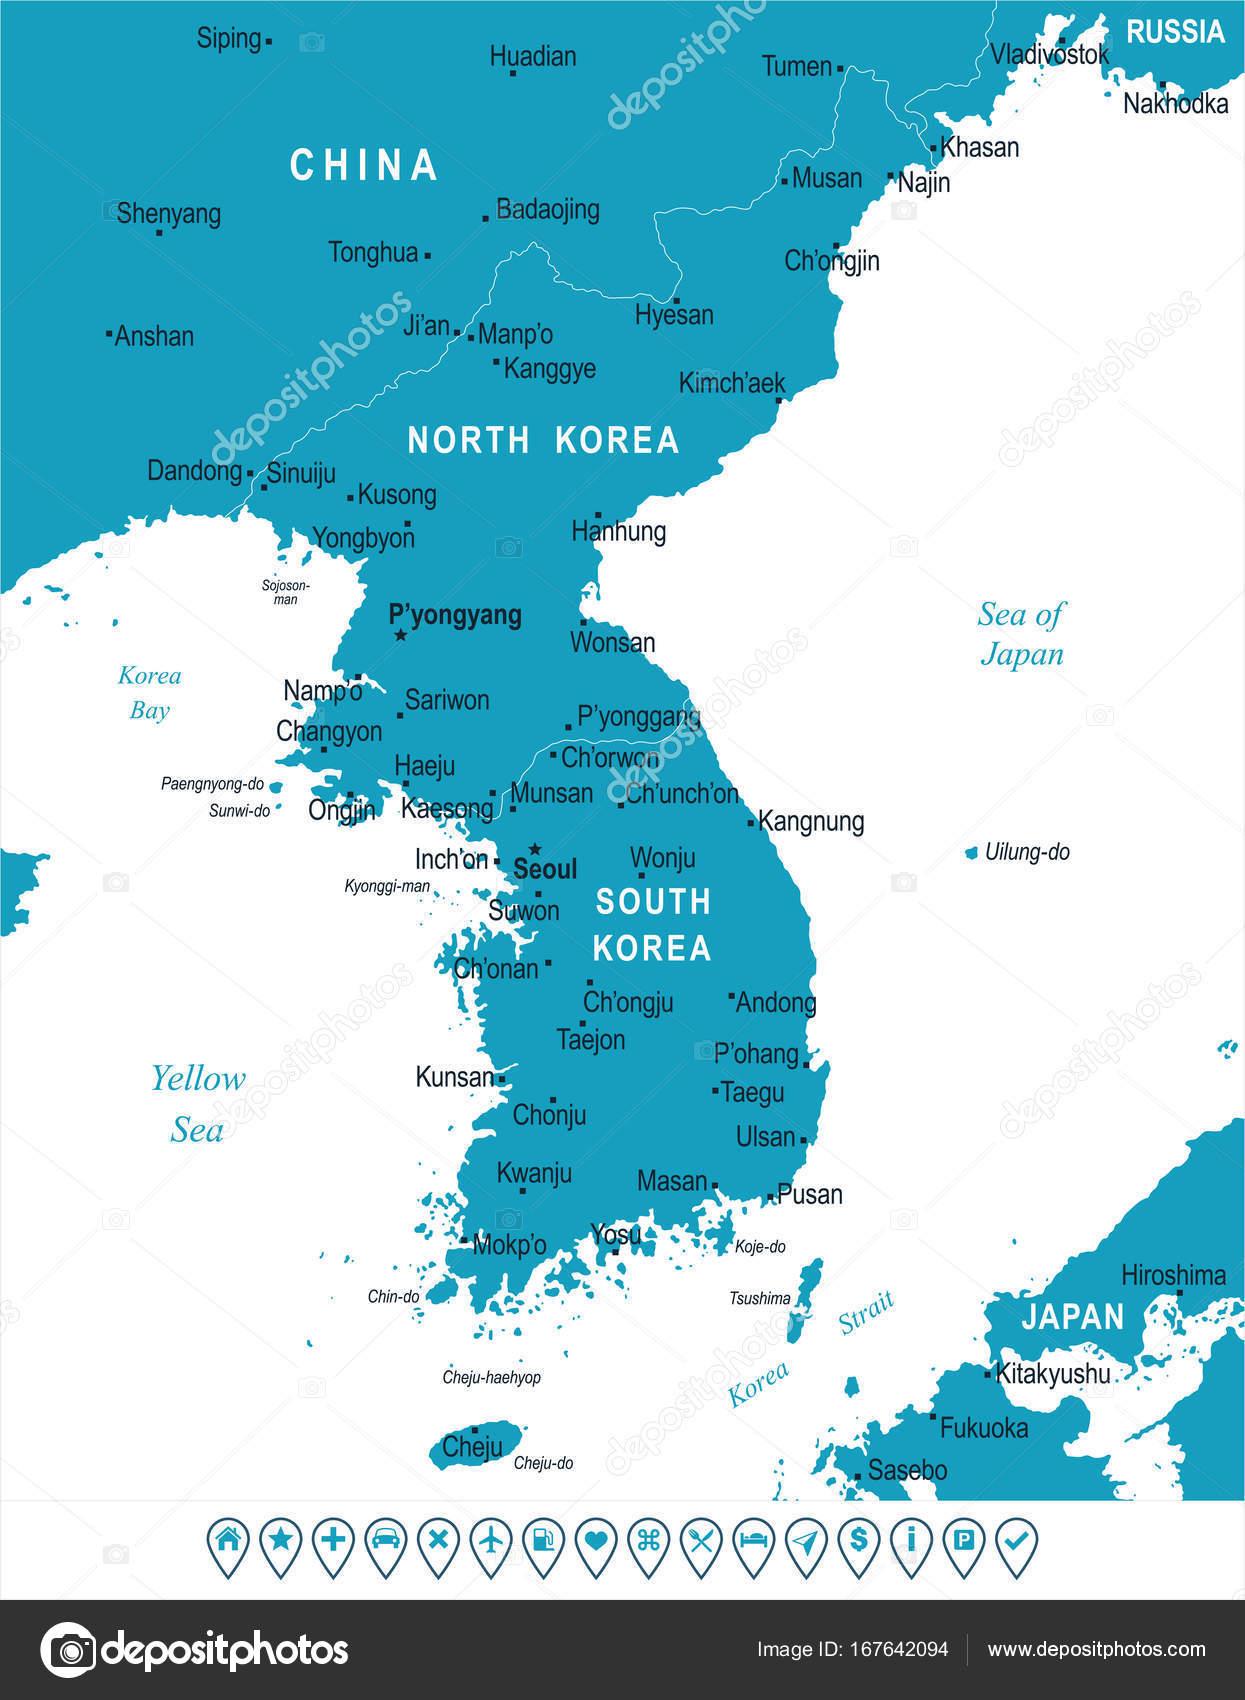 Korean peninsula map vector illustration stock vector korean peninsula map vector illustration stock vector gumiabroncs Gallery